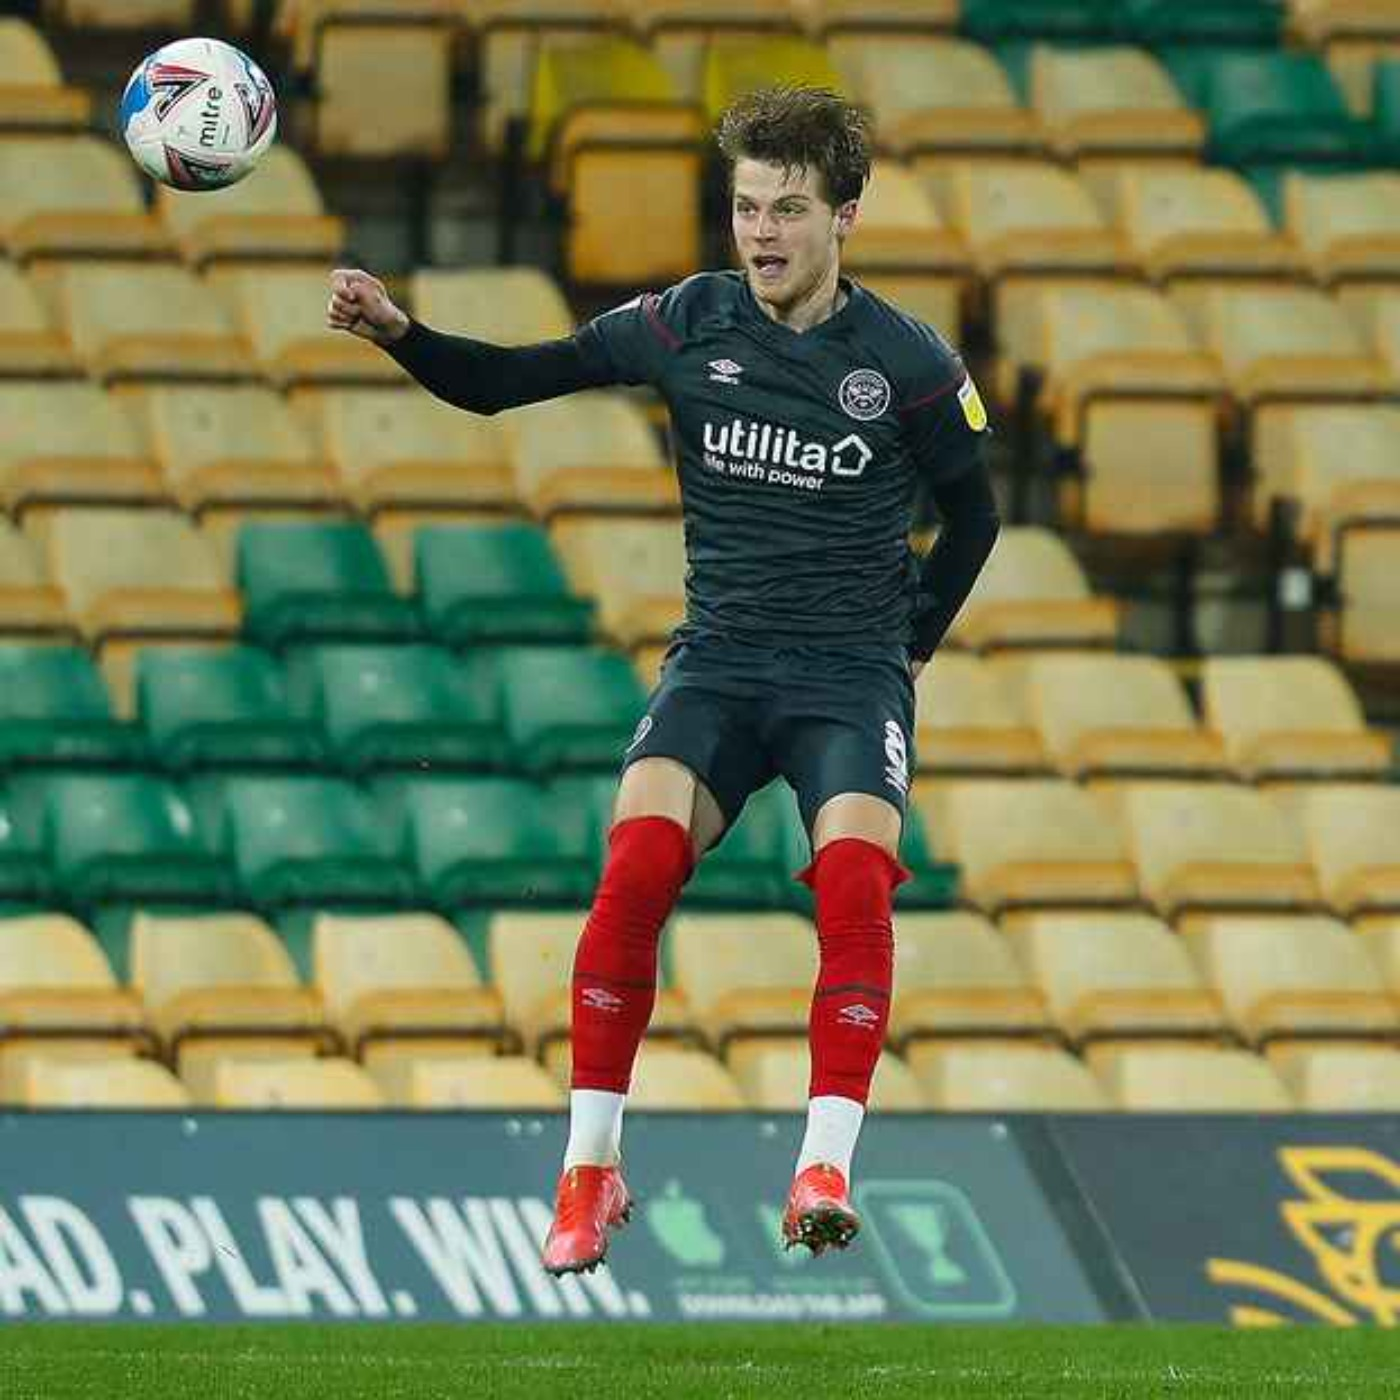 Norwich City V Brentford